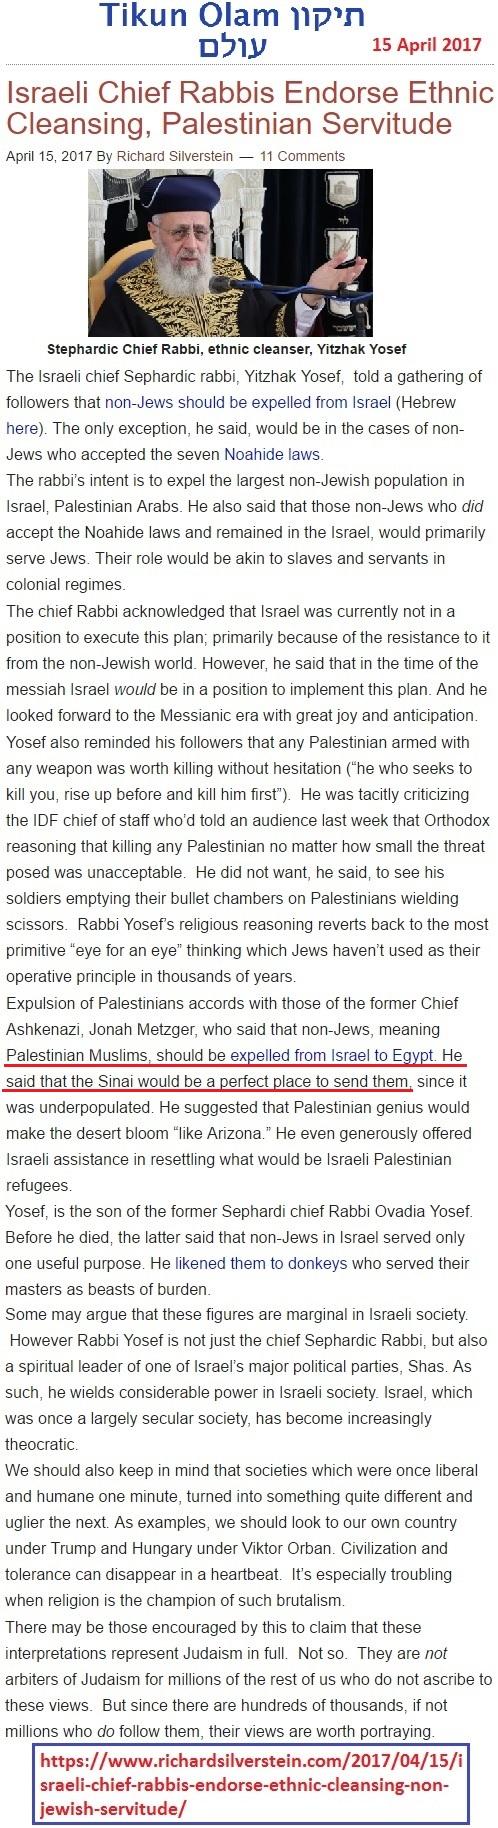 https://www.richardsilverstein.com/2017/04/15/israeli-chief-rabbis-endorse-ethnic-cleansing-non-jewish-servitude/